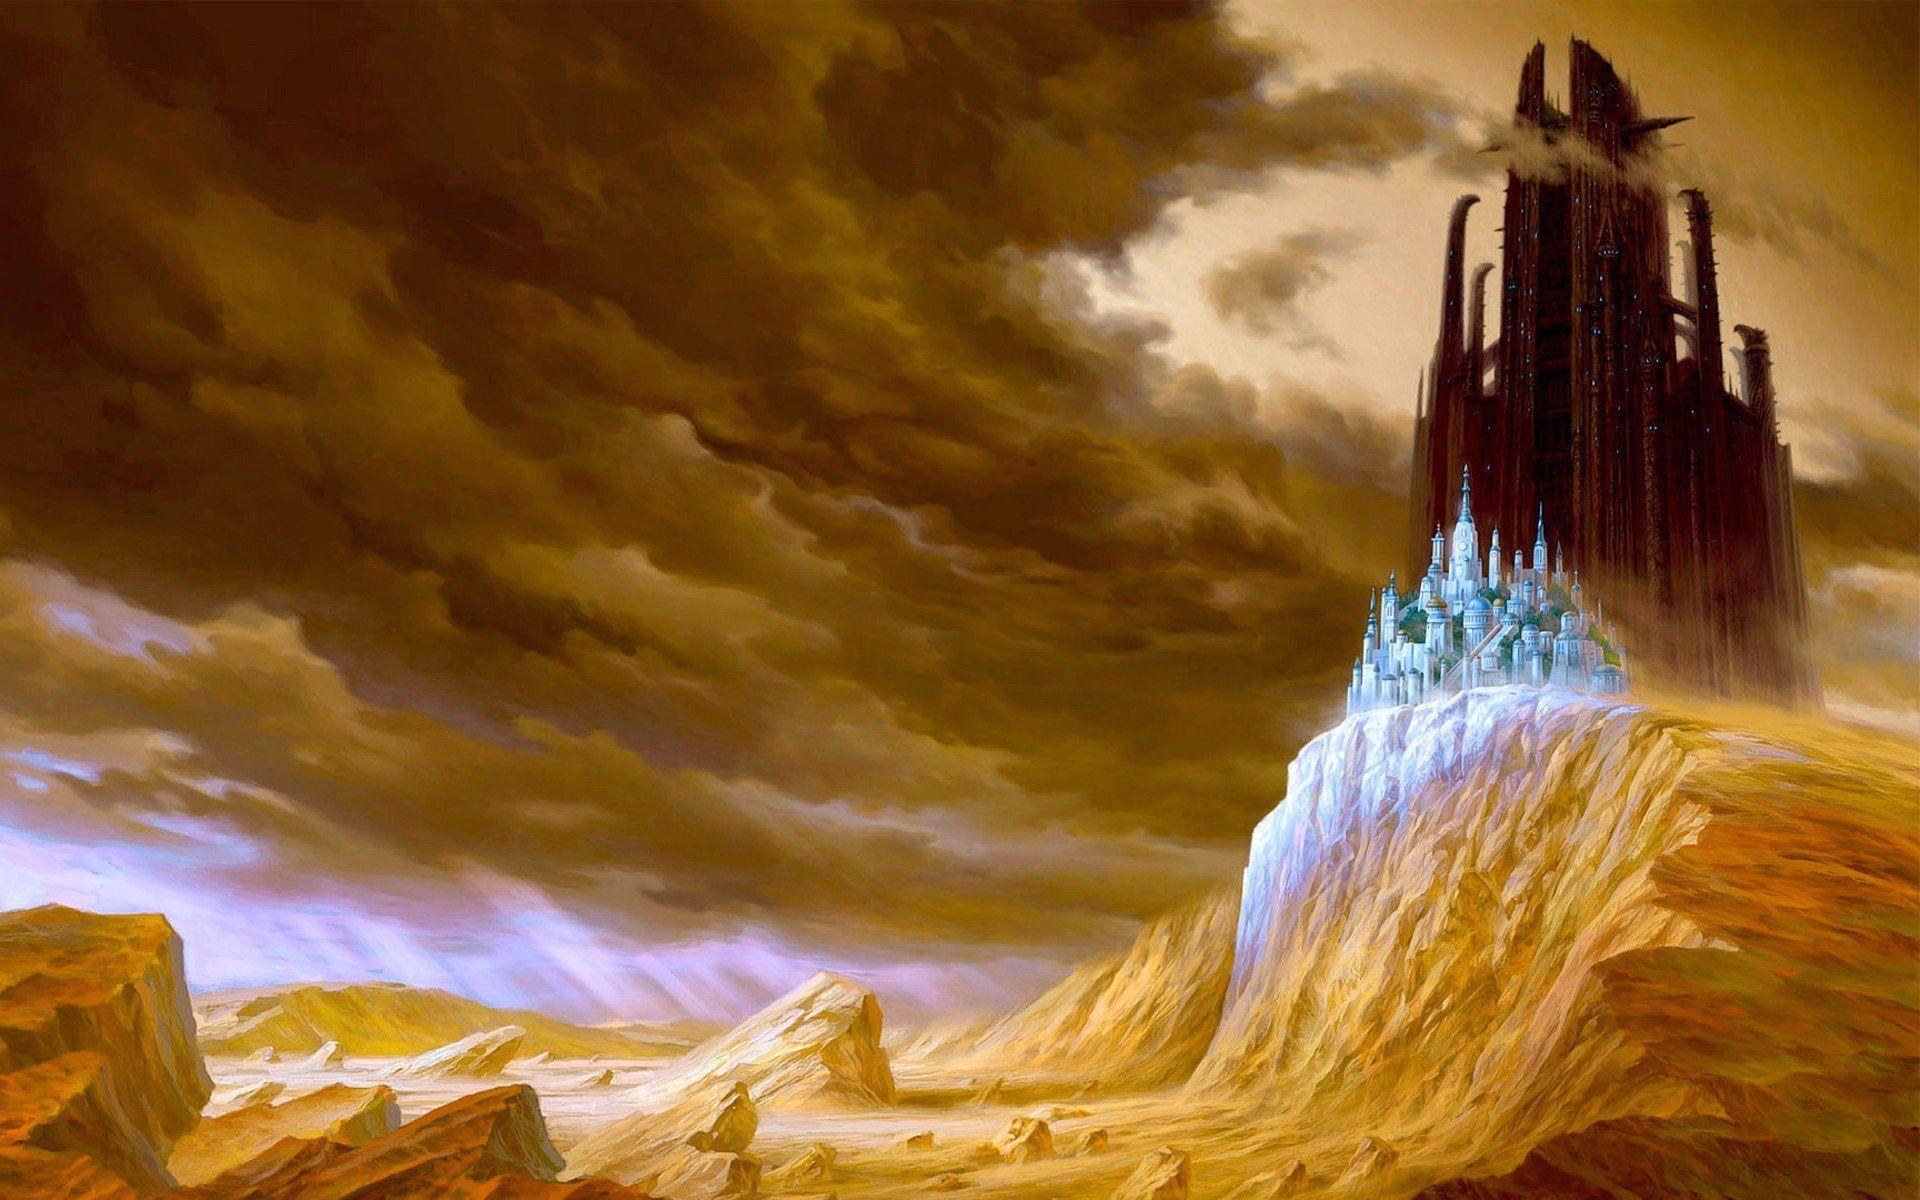 Mortal Engines Wallpapers - Wallpaper Cave